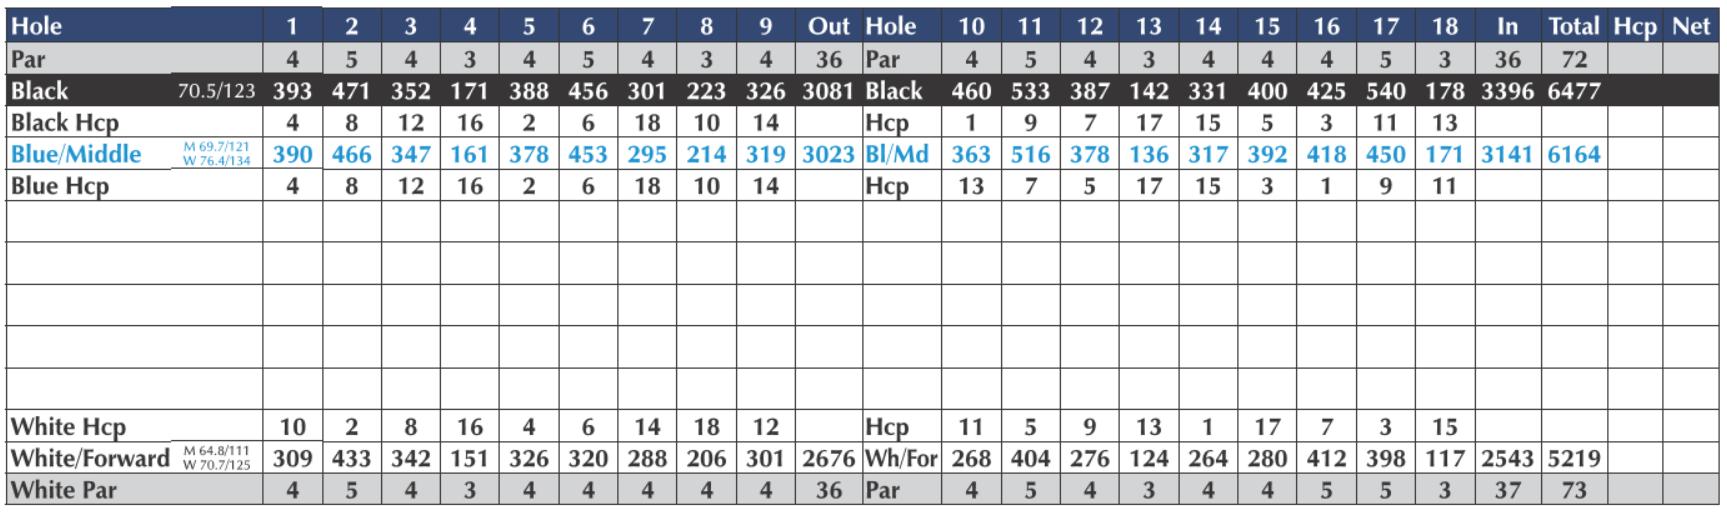 Scorecards - holes